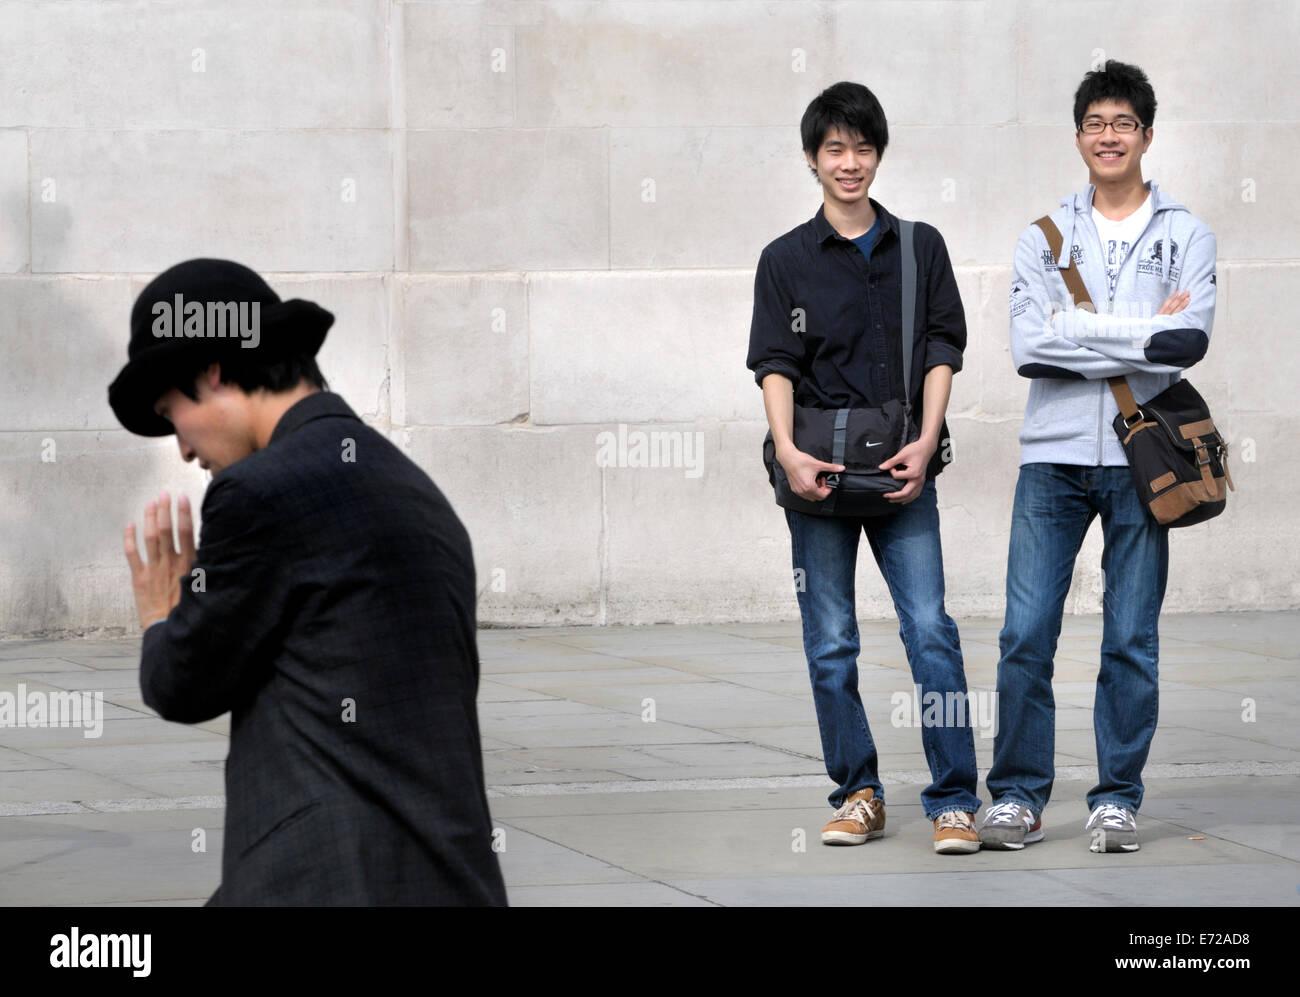 London, England, UK. Tourists watching a mime artist in Trafalgar Square - Stock Image